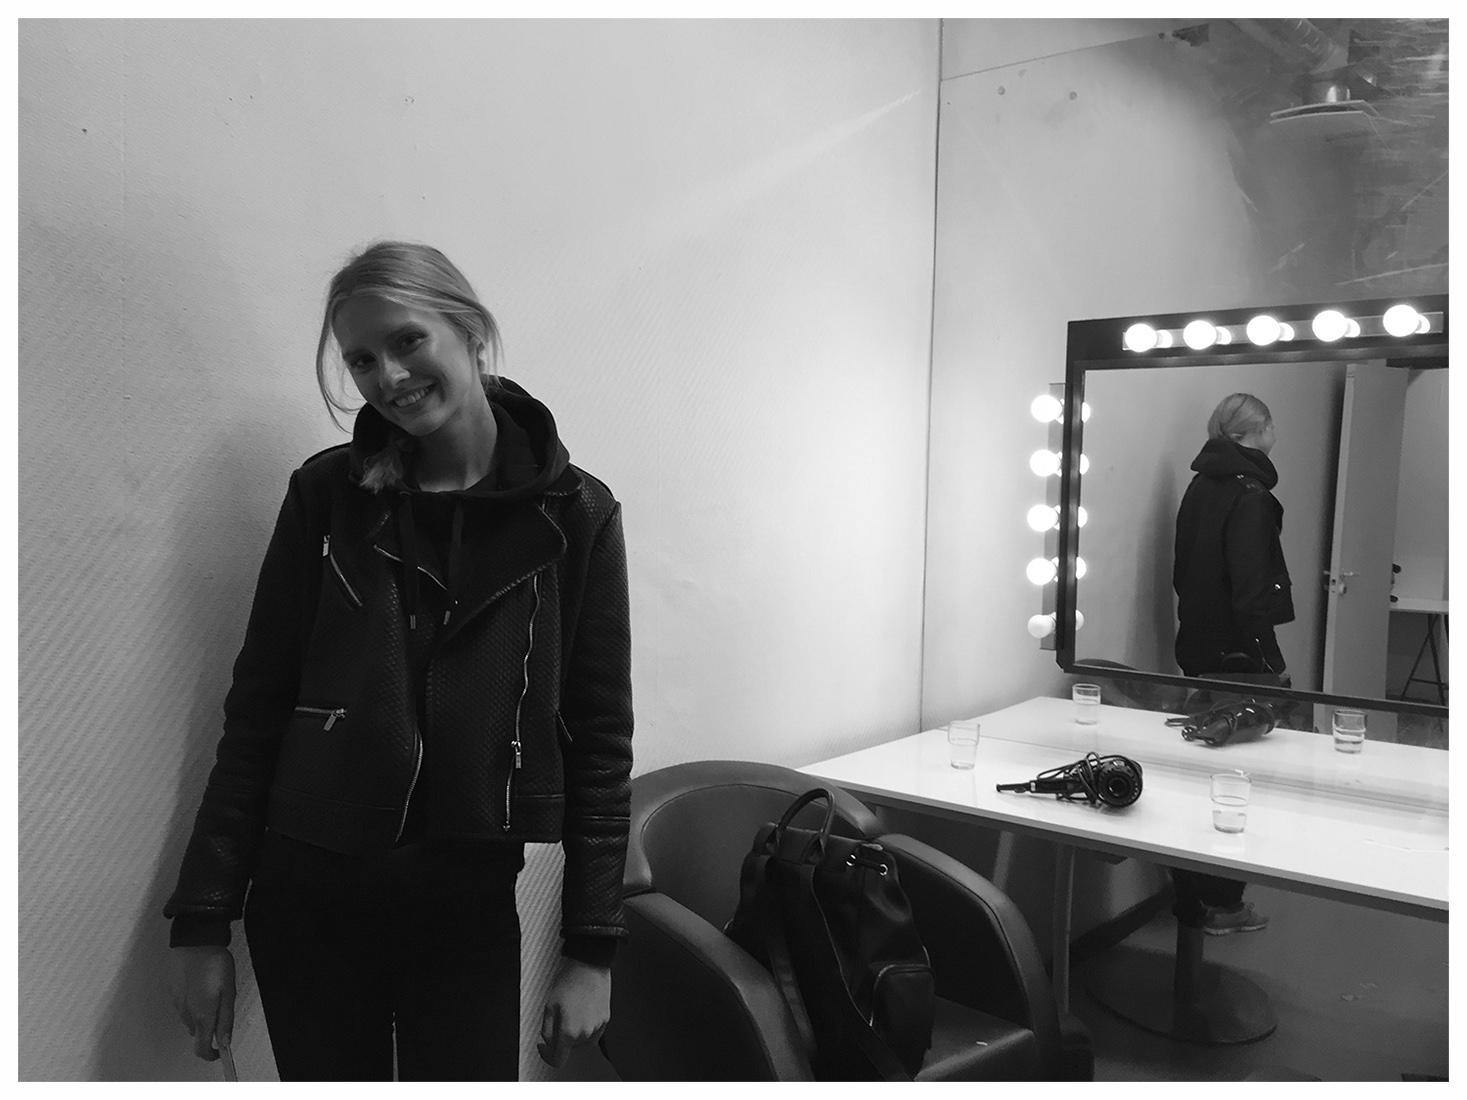 Modell backstage.jpg